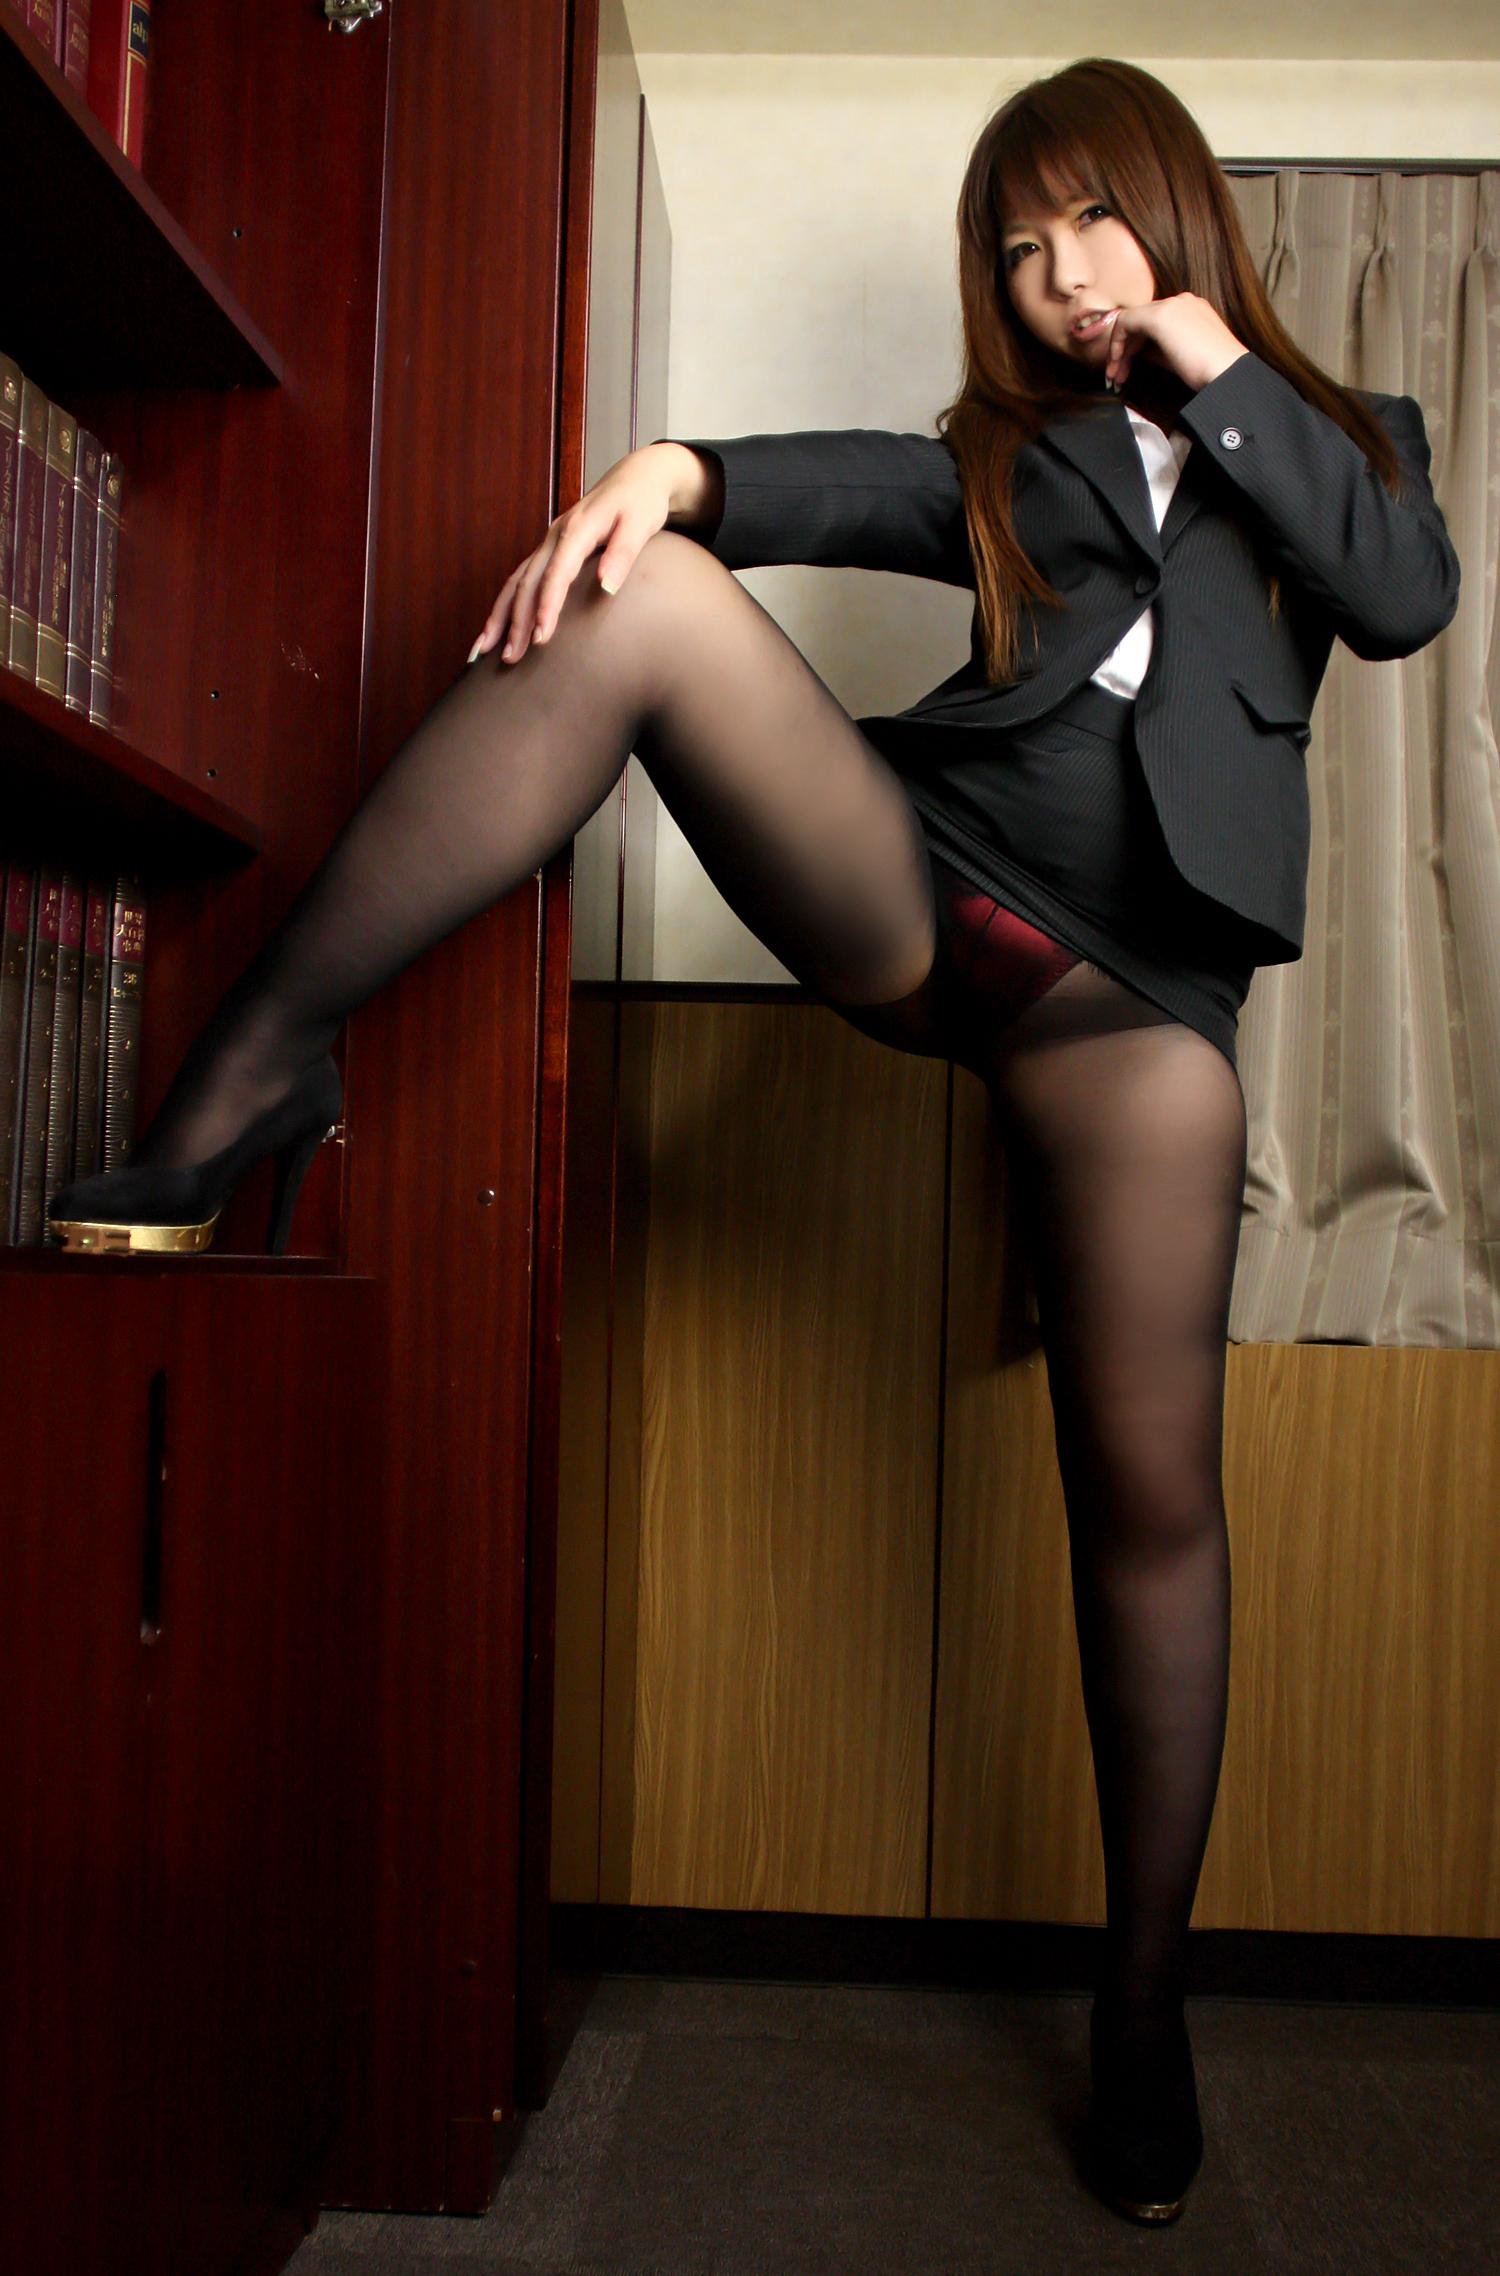 [Higurashi Kikaku 日暮企画 (Rin Higurashi 日暮りん)] OLおさぼりデイユース (Office Lady) [452P972MB]